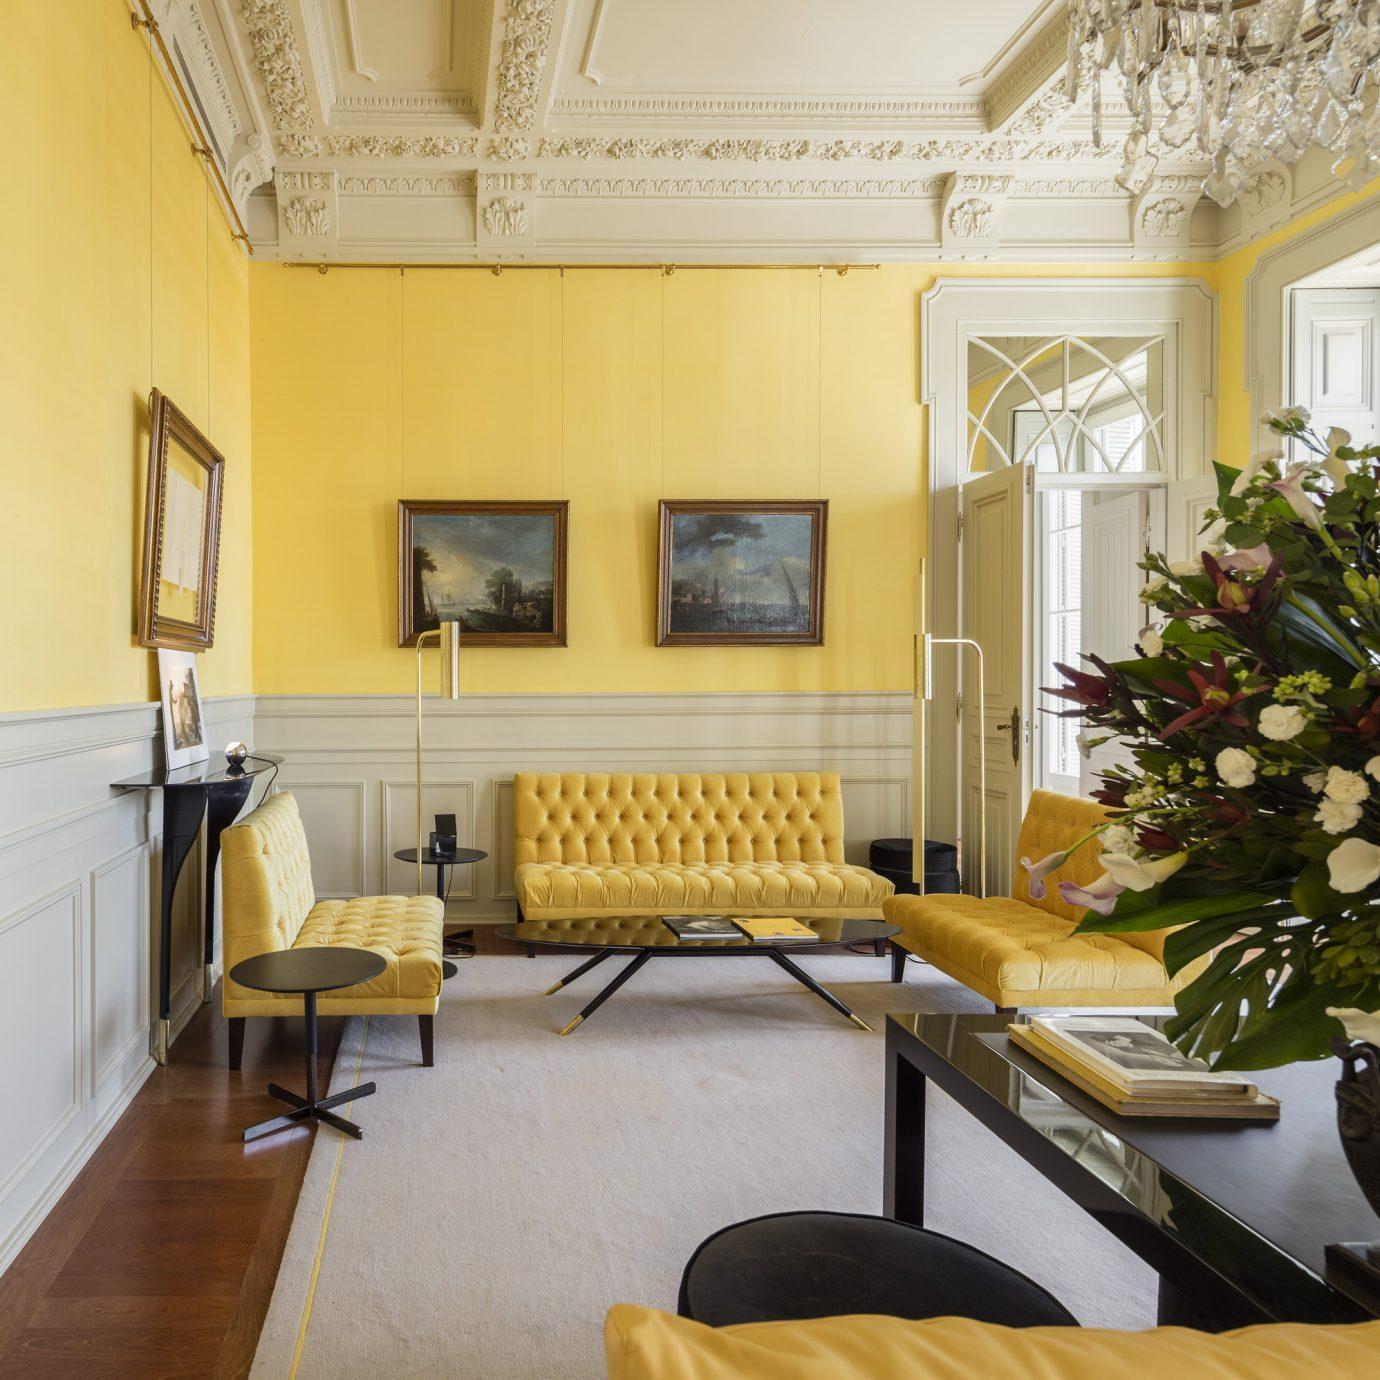 Luxurious room with bright yellow decor at Verride Palácio Santa Catarina